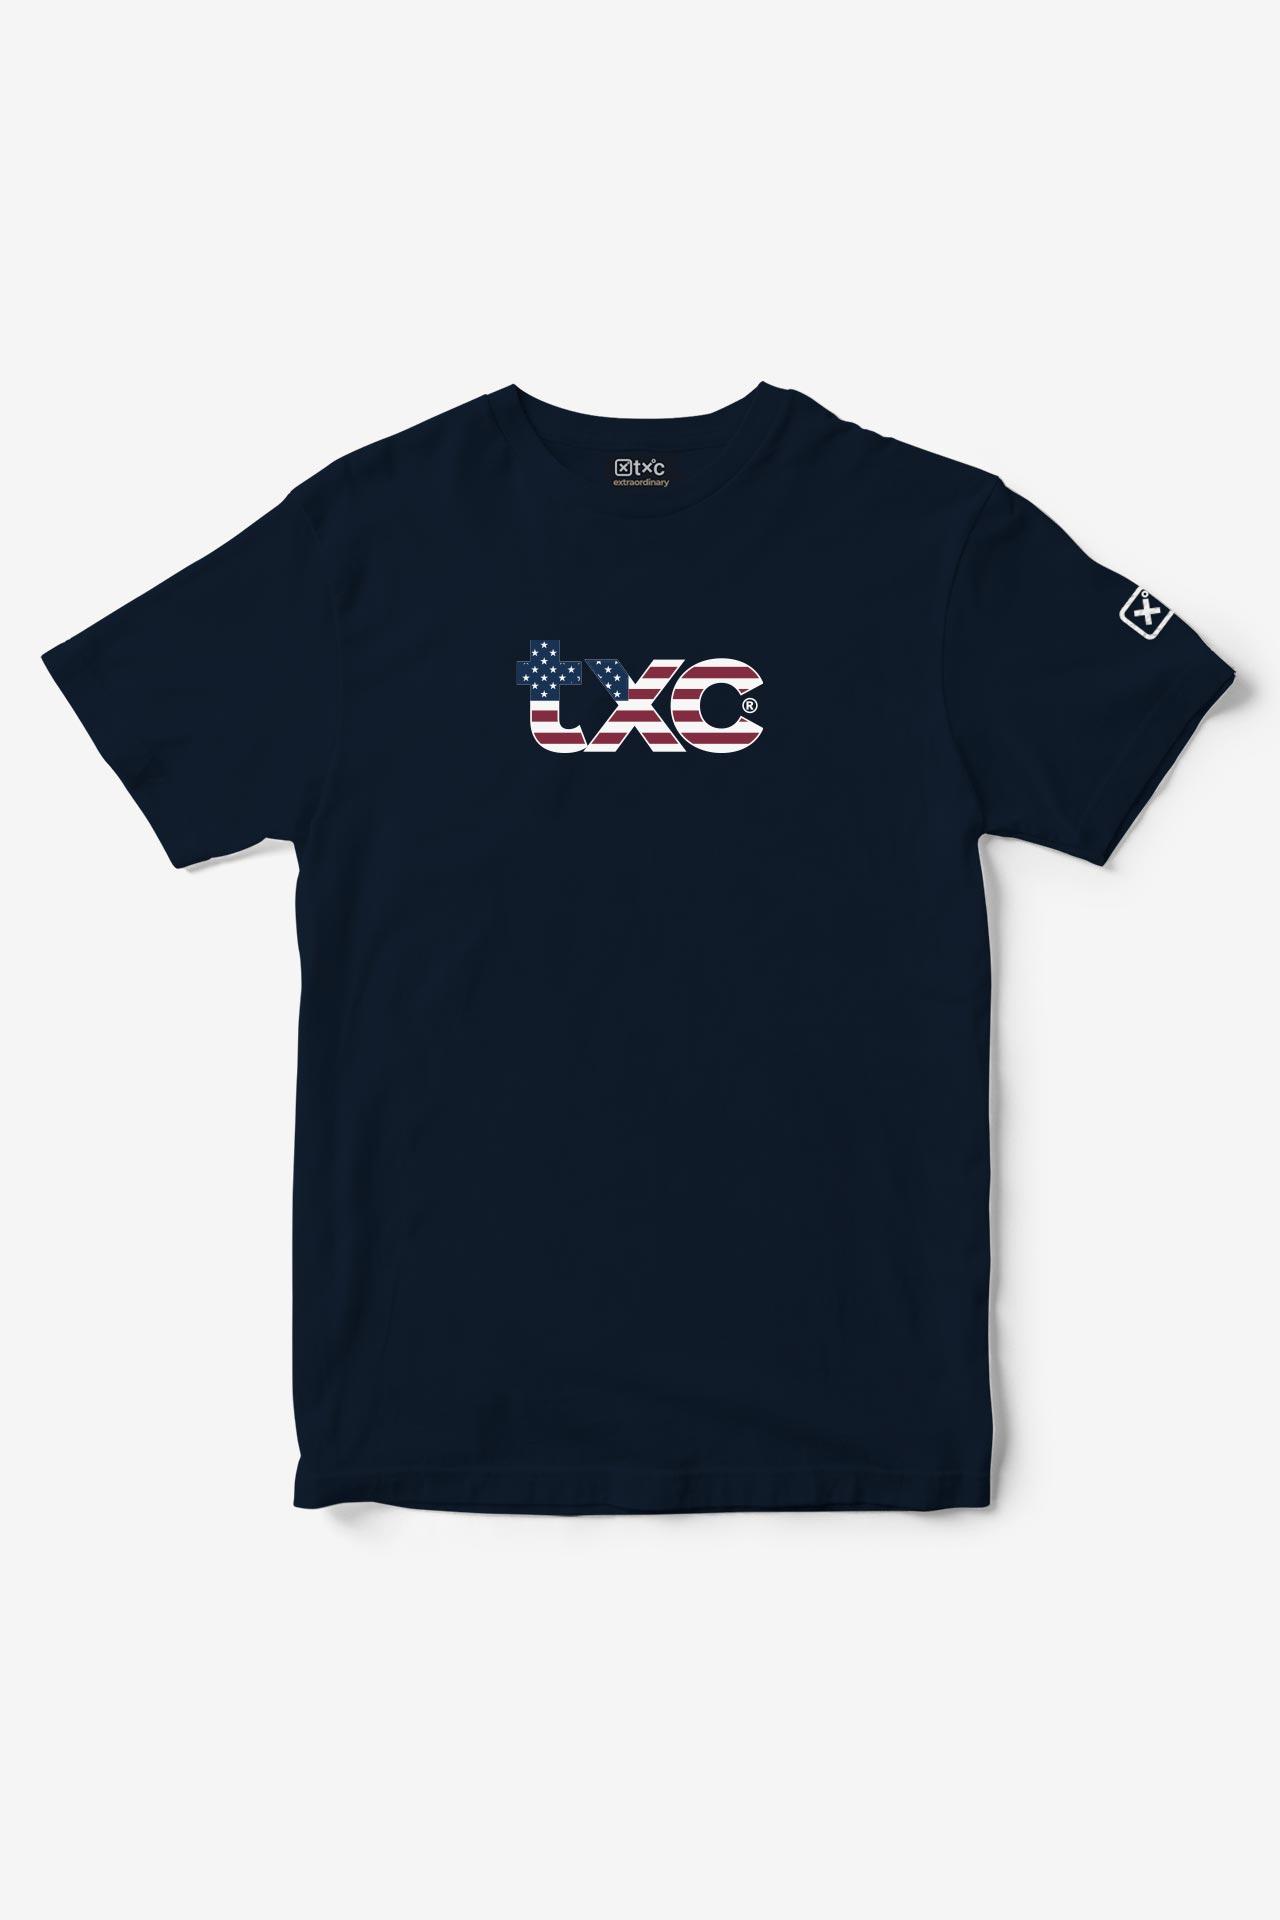 Camiseta Infantil TXC 14164I